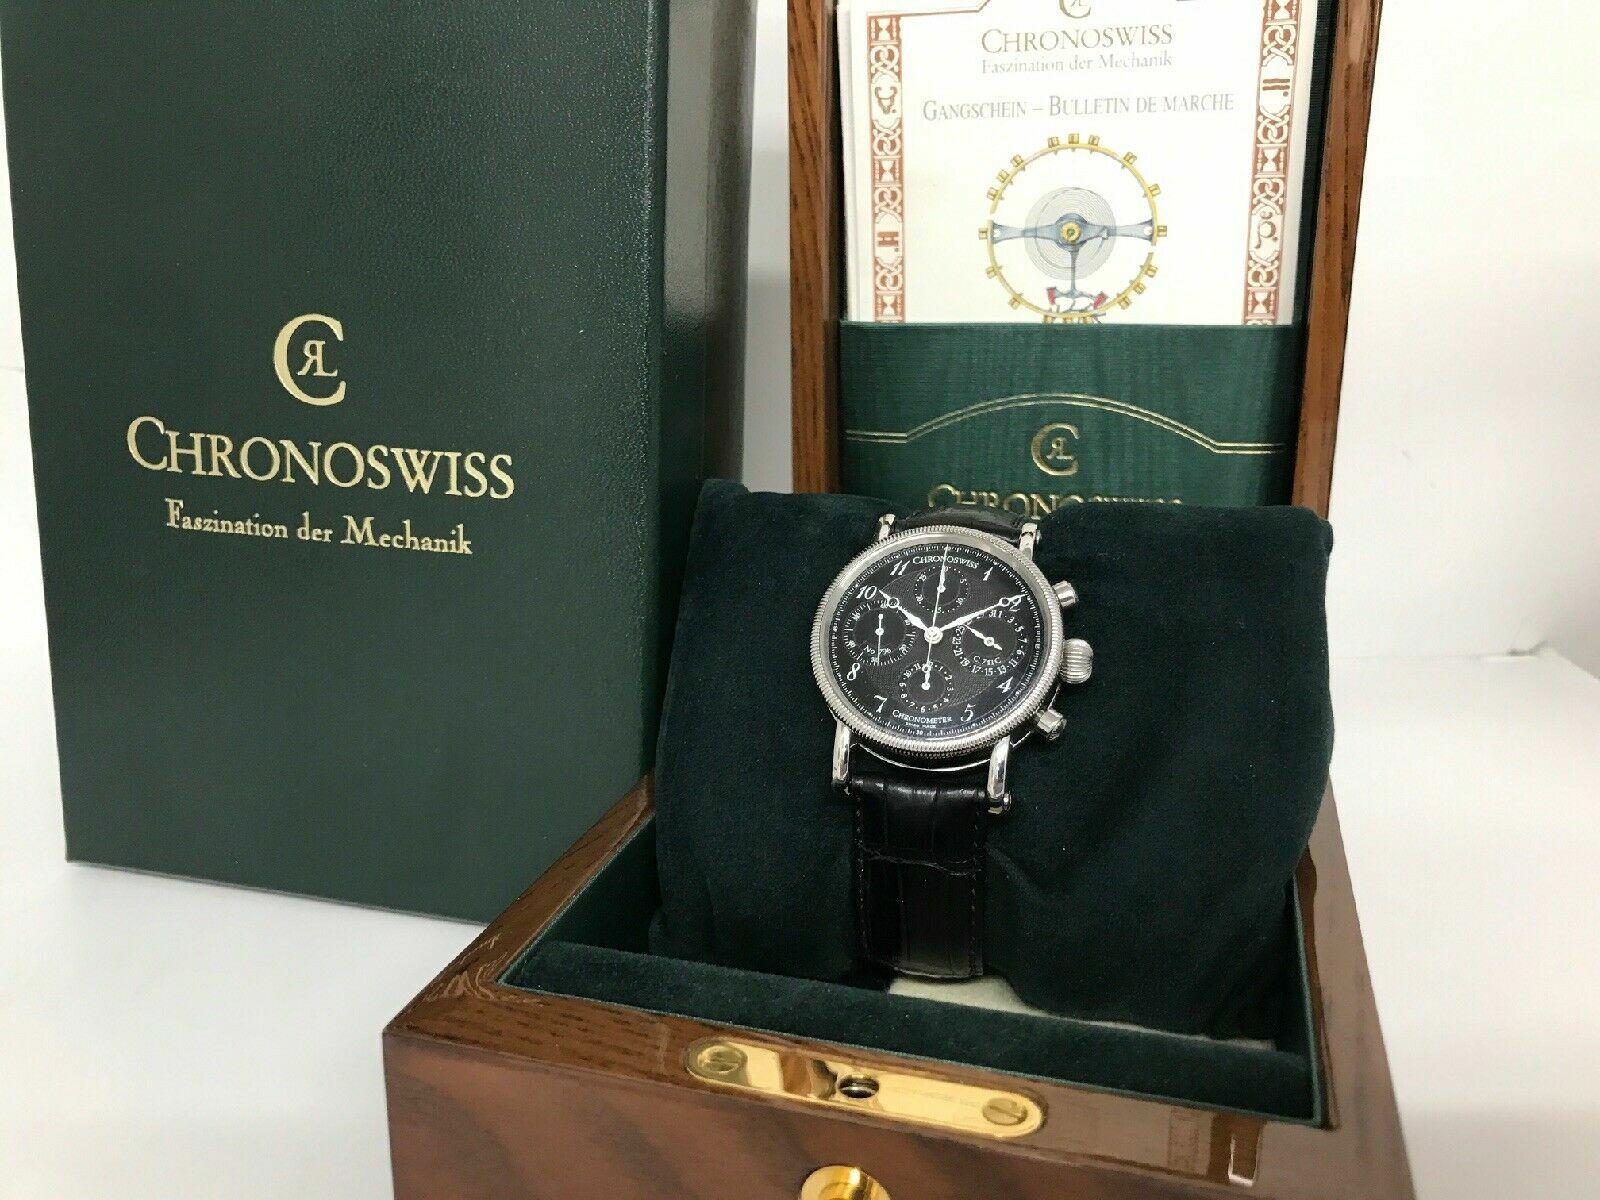 Chronoswiss Opus Chronograph CS741